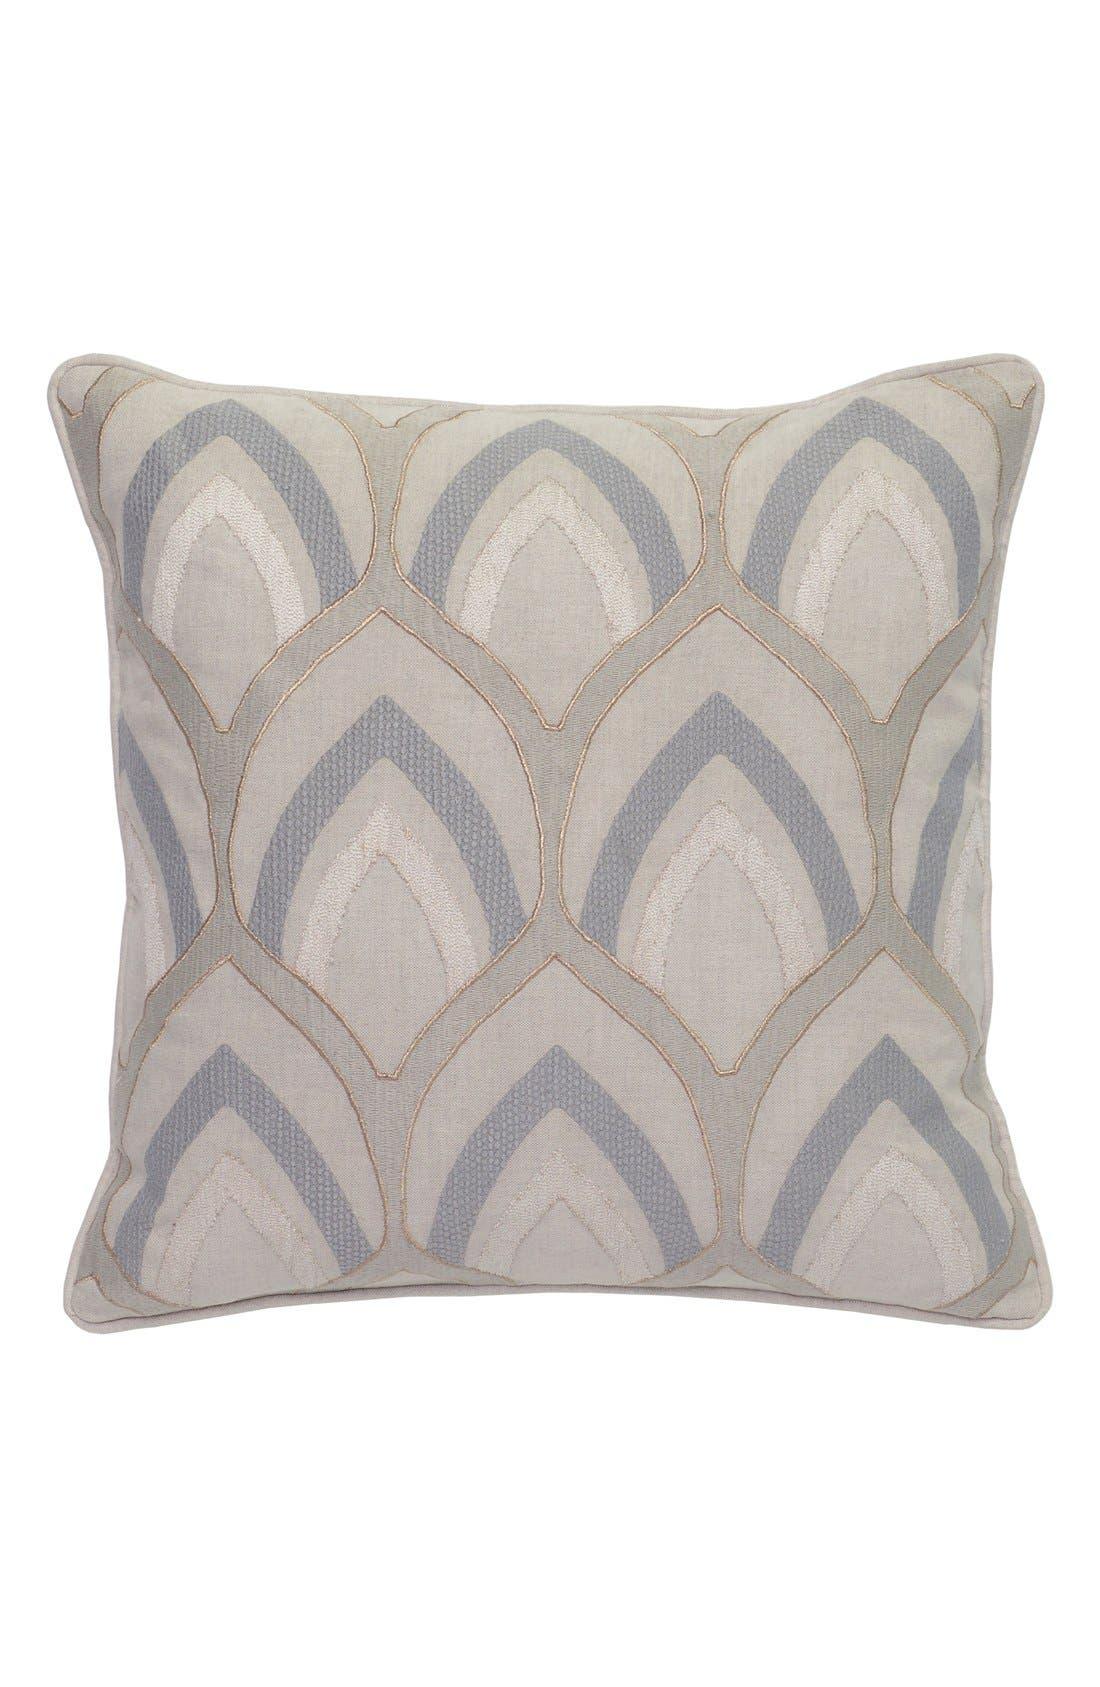 Villa Home Collection 'Hollis' Decorative Pillow